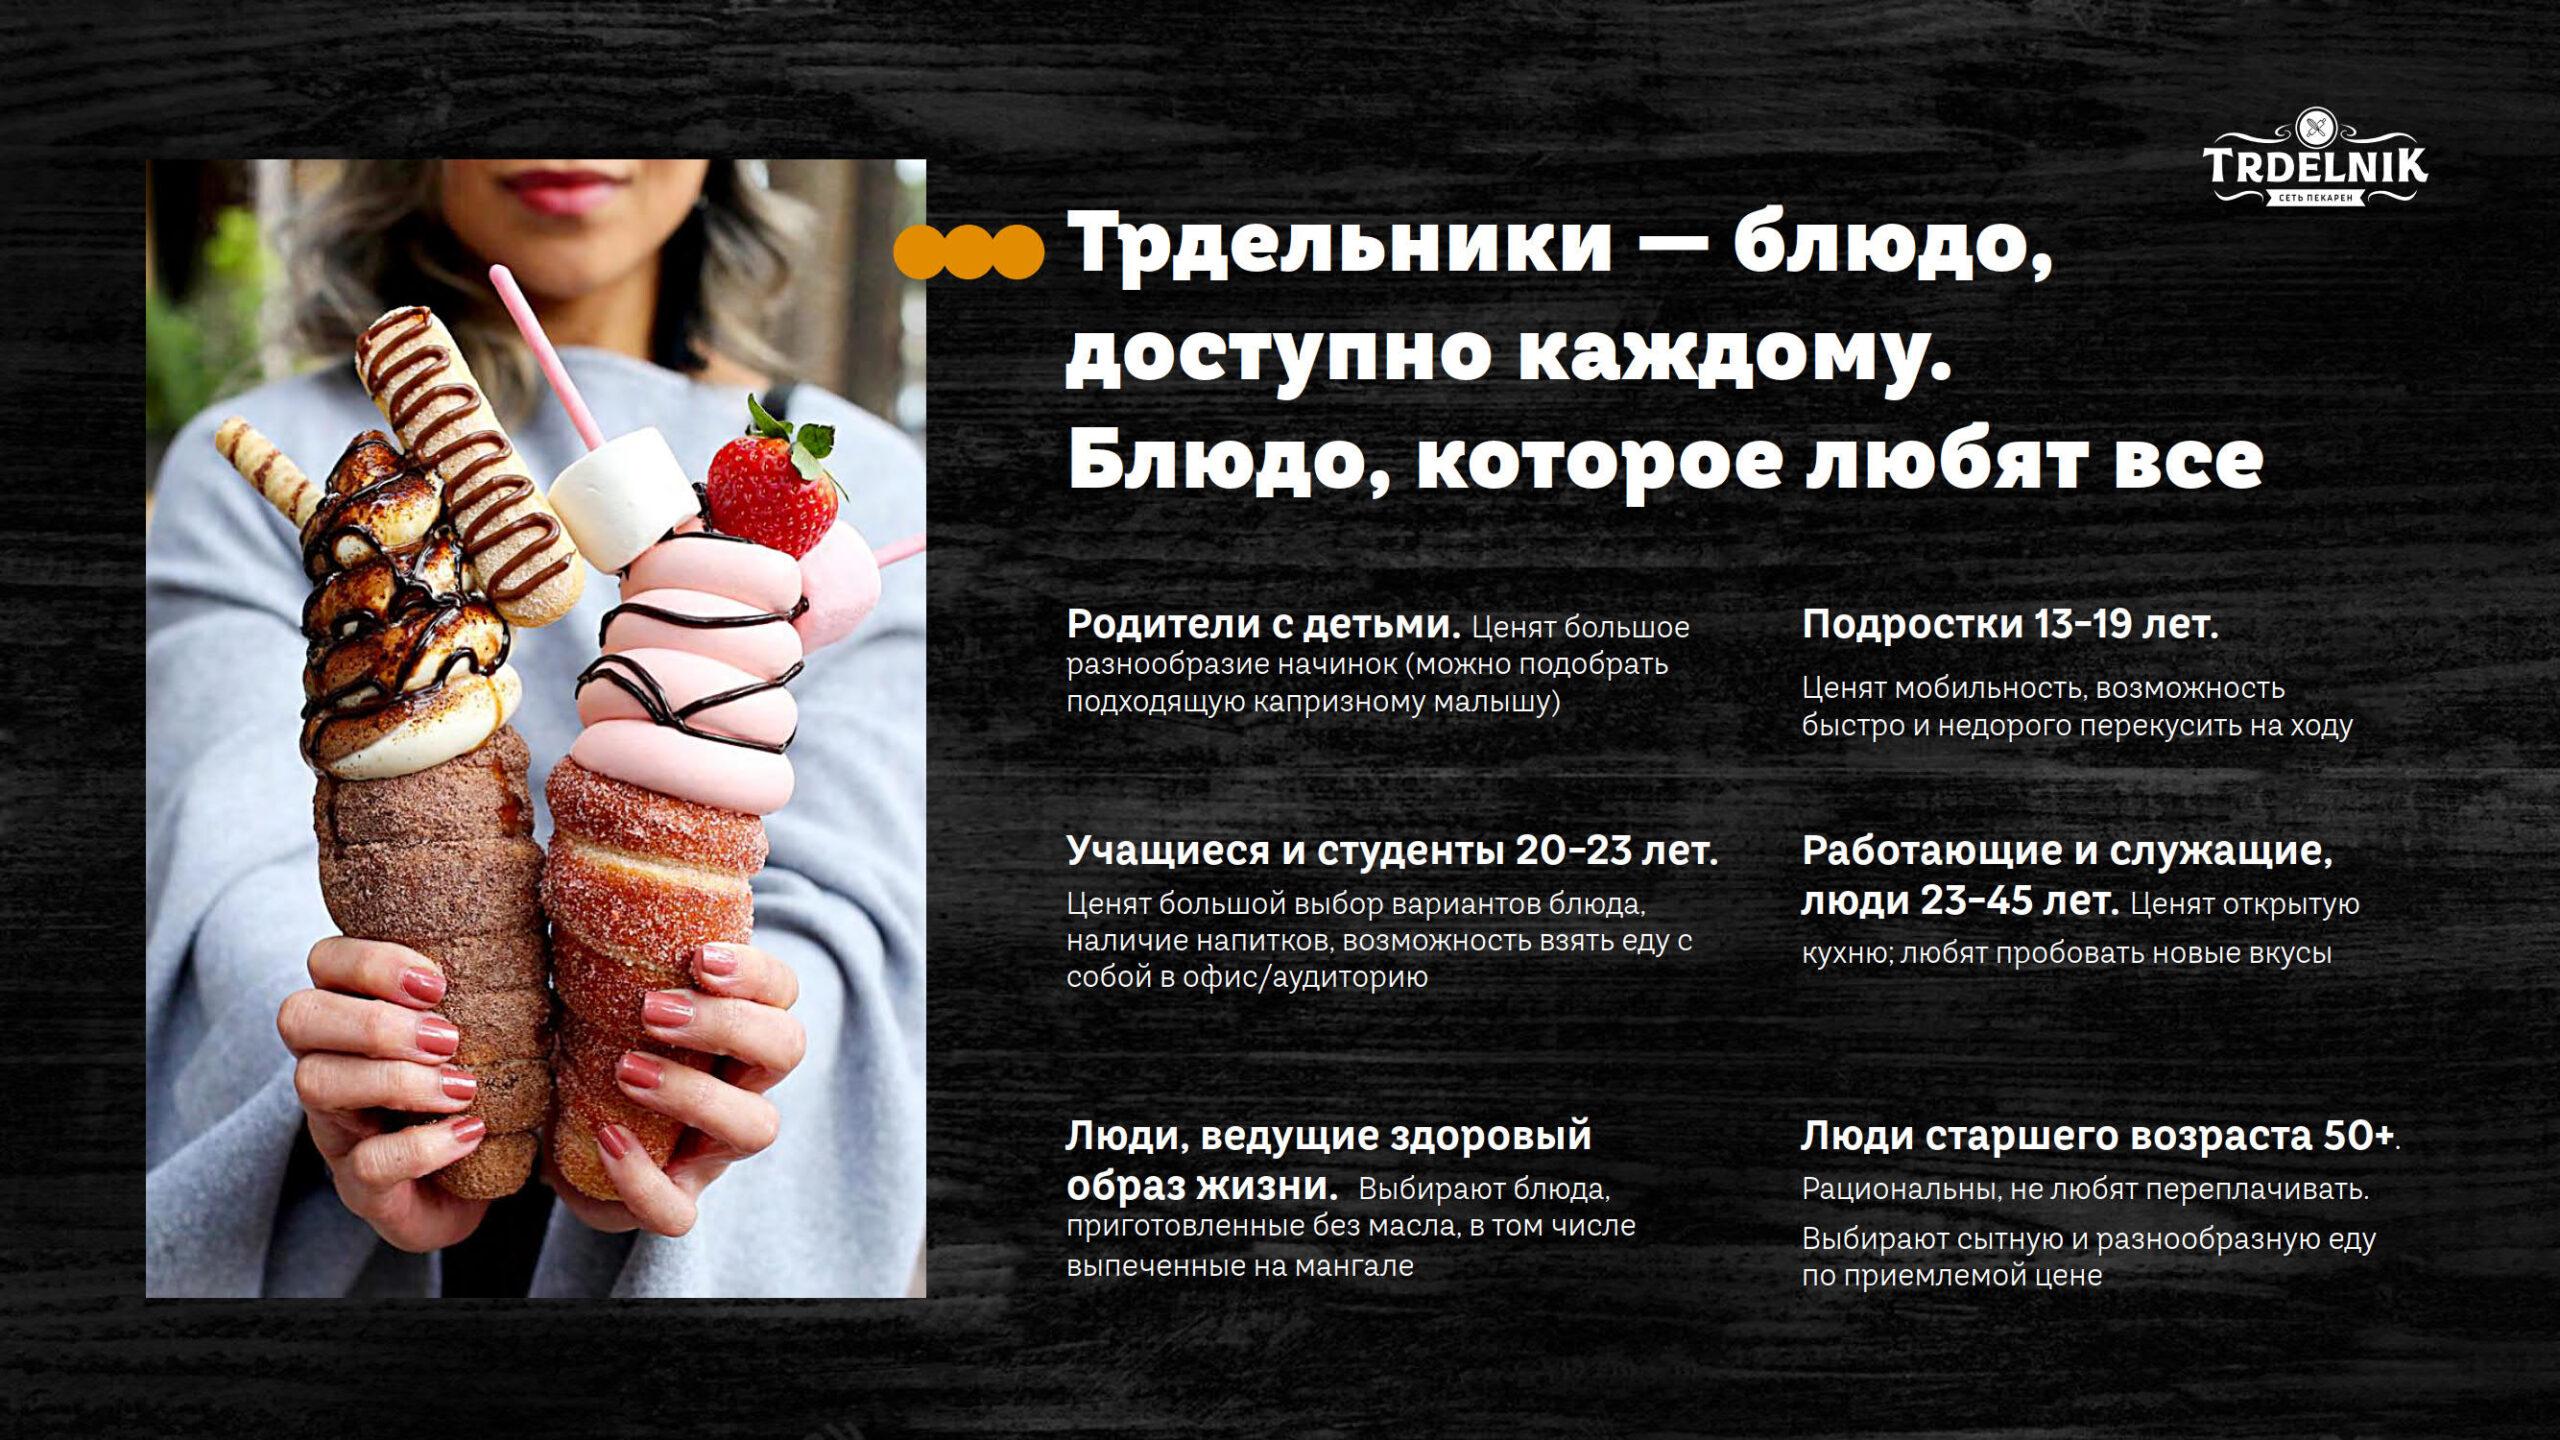 Презентация сети пекарен Trdelnik